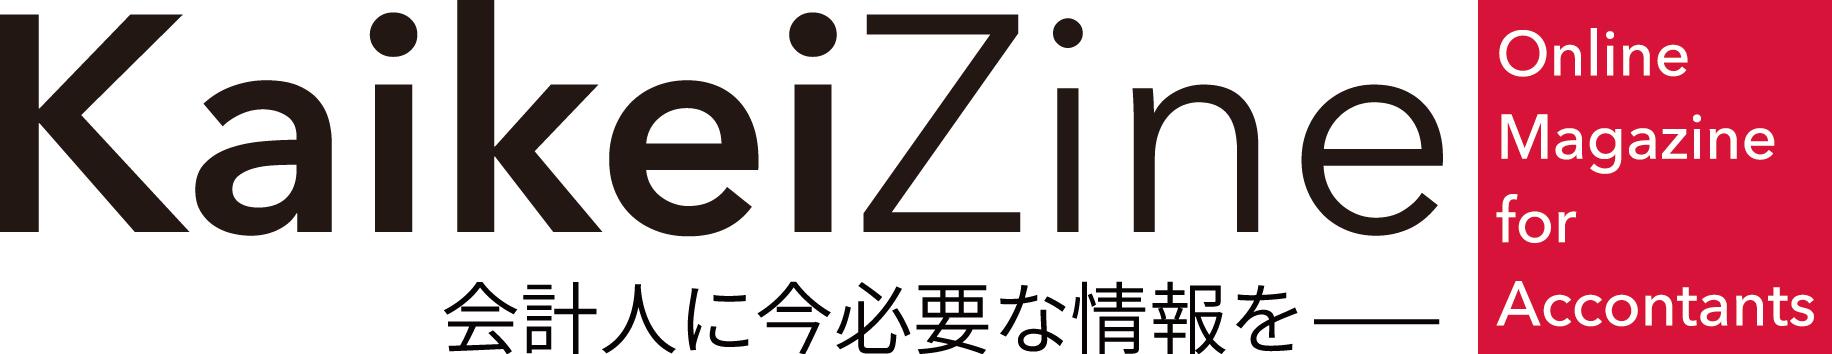 kaikeizine_logo